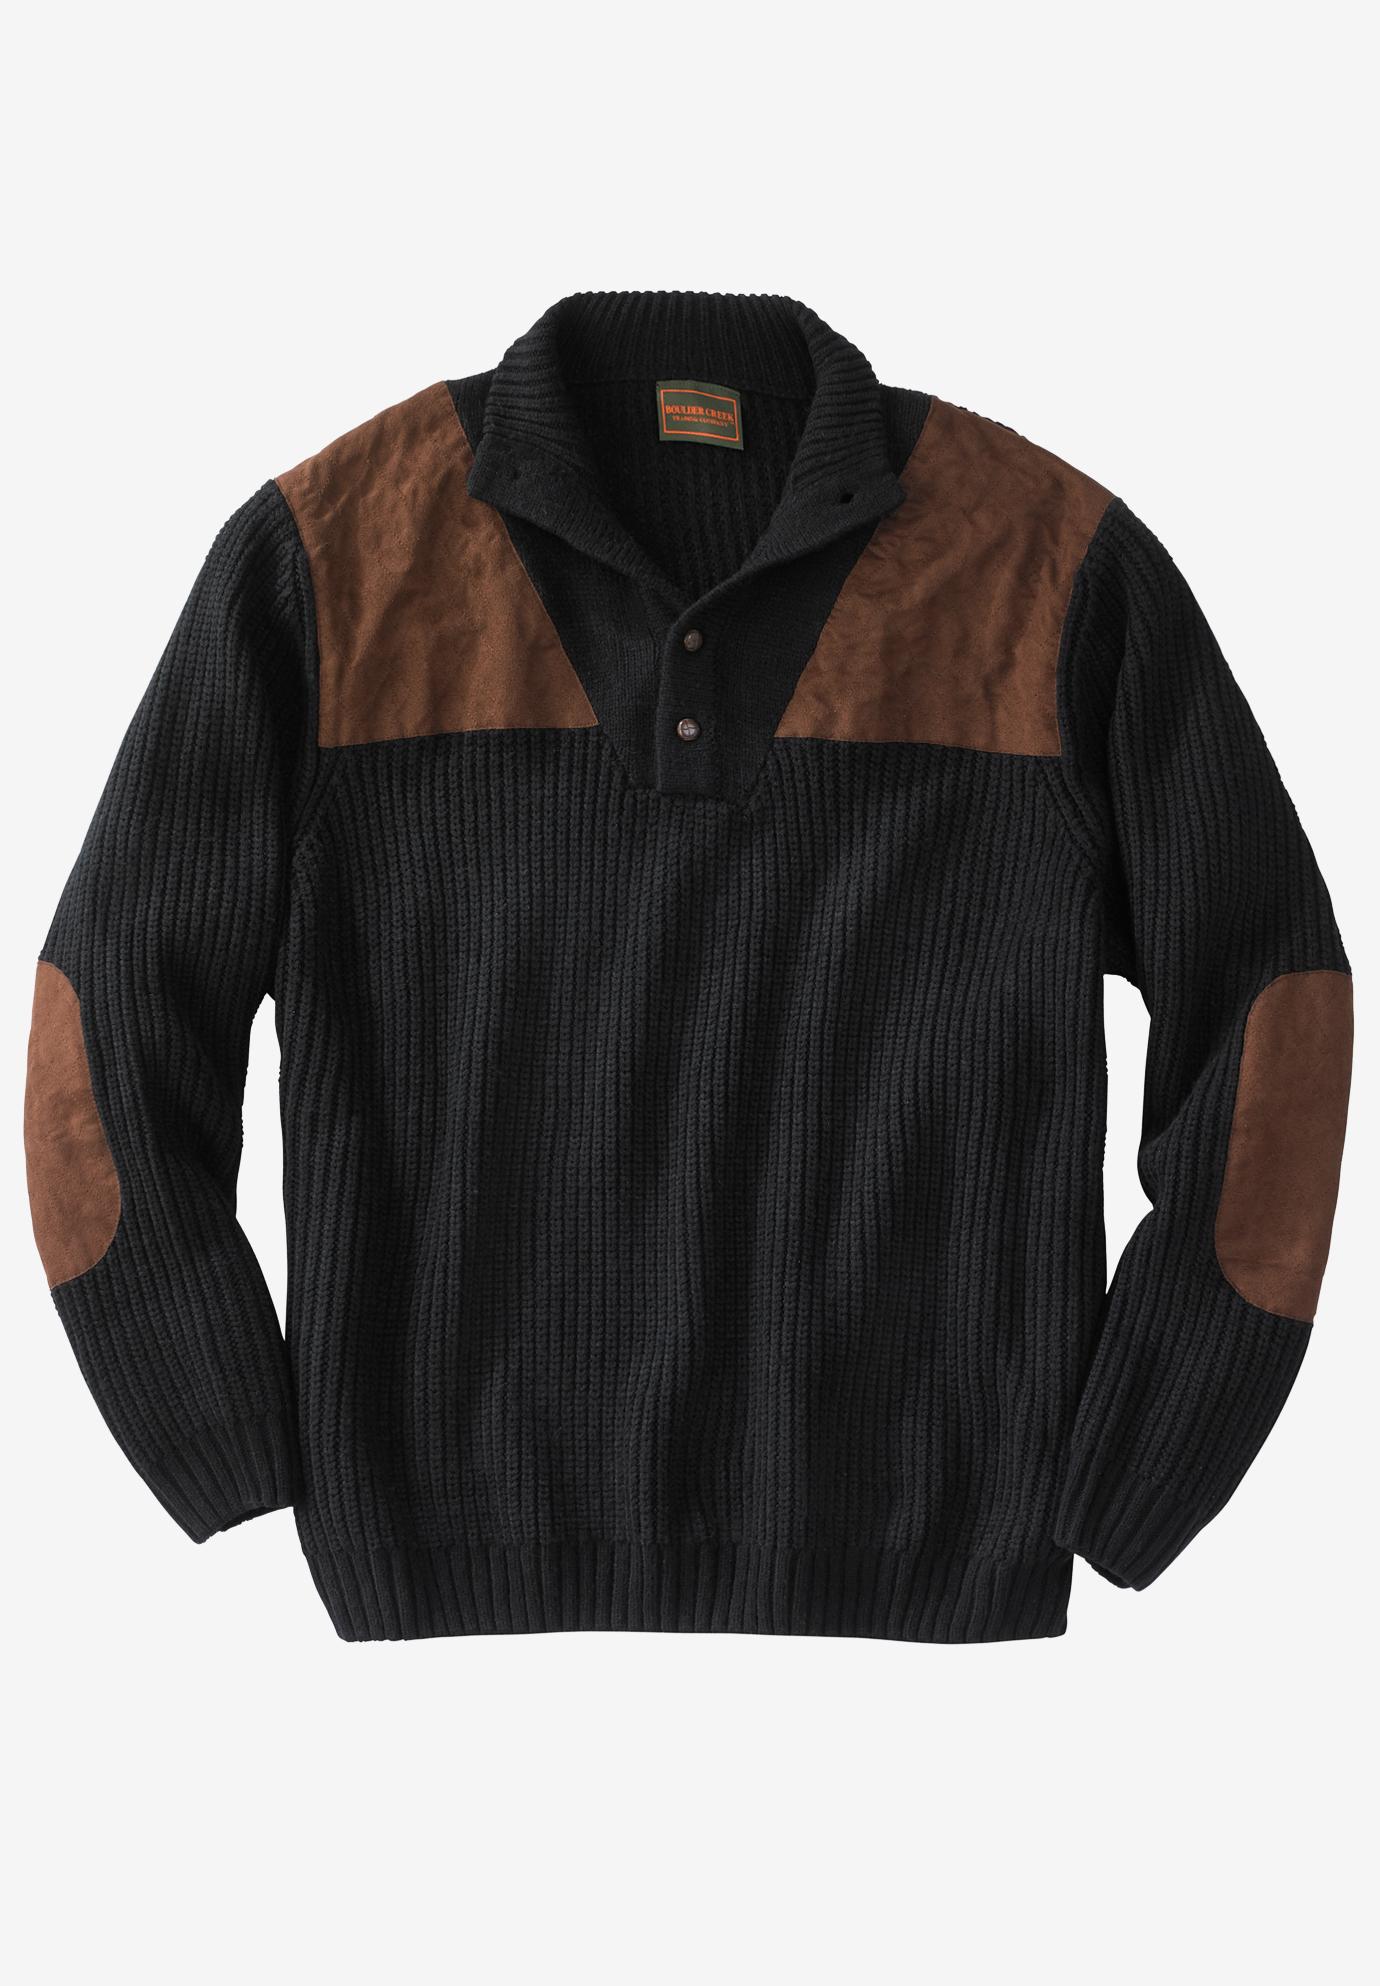 Mock Neck Shooter Sweater By Boulder Creek 174 Plus Size